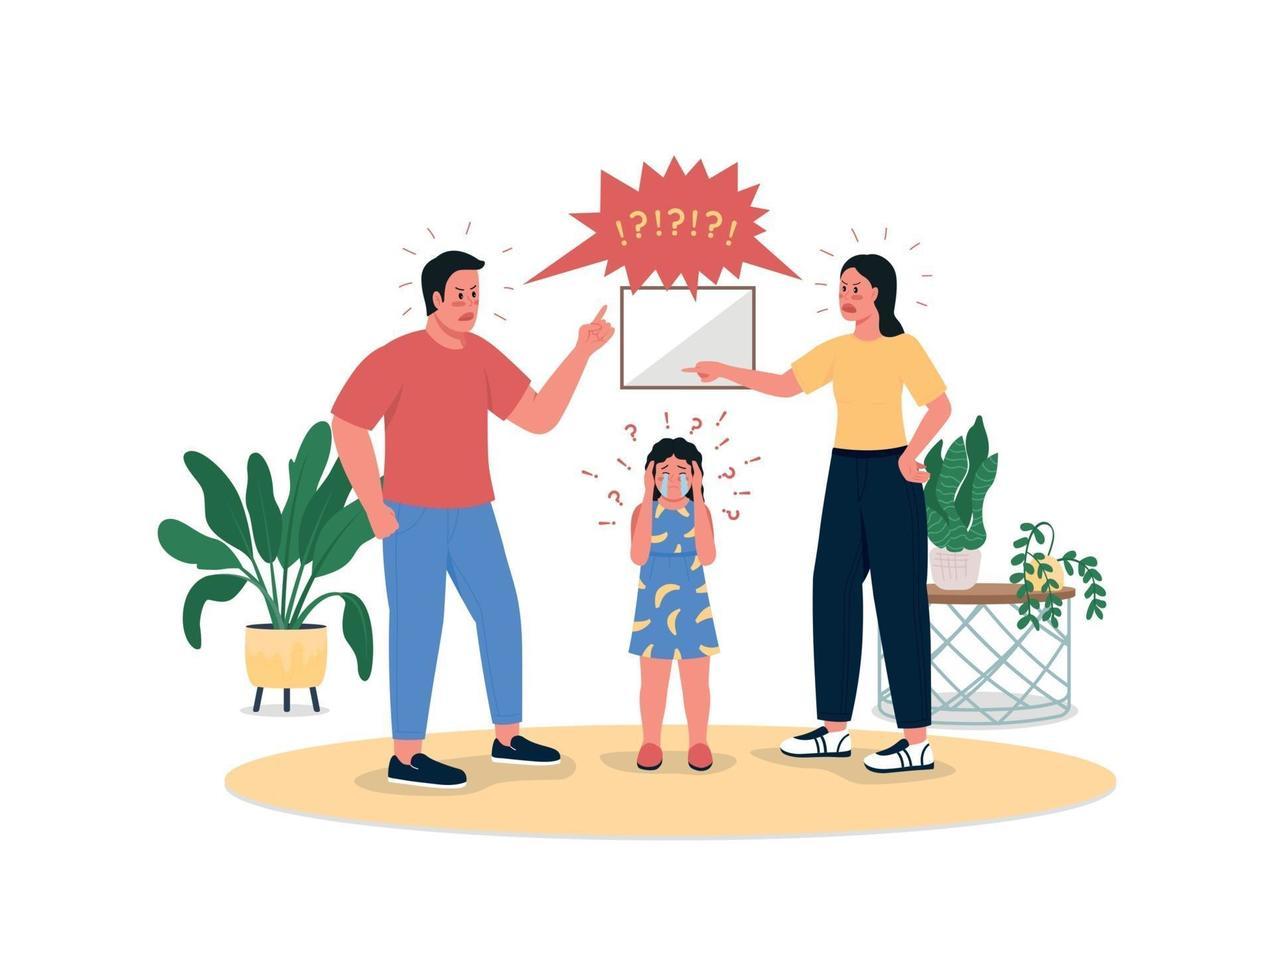 vechtende ouders en huilende dochter egale kleur vector gedetailleerde karakters